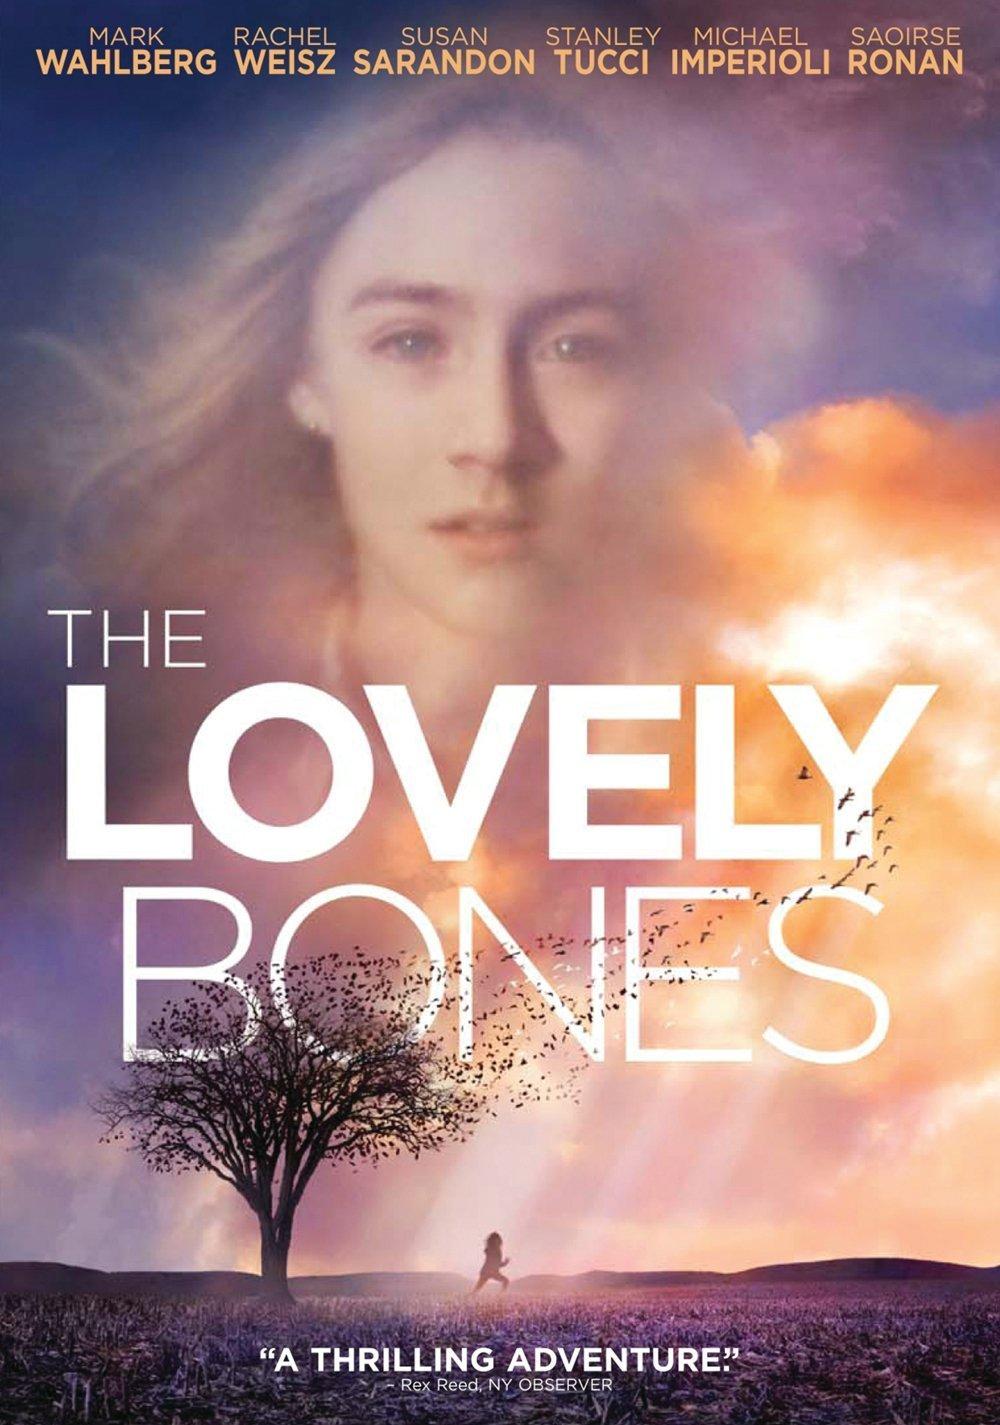 Lovely film the bones Pevné pouto